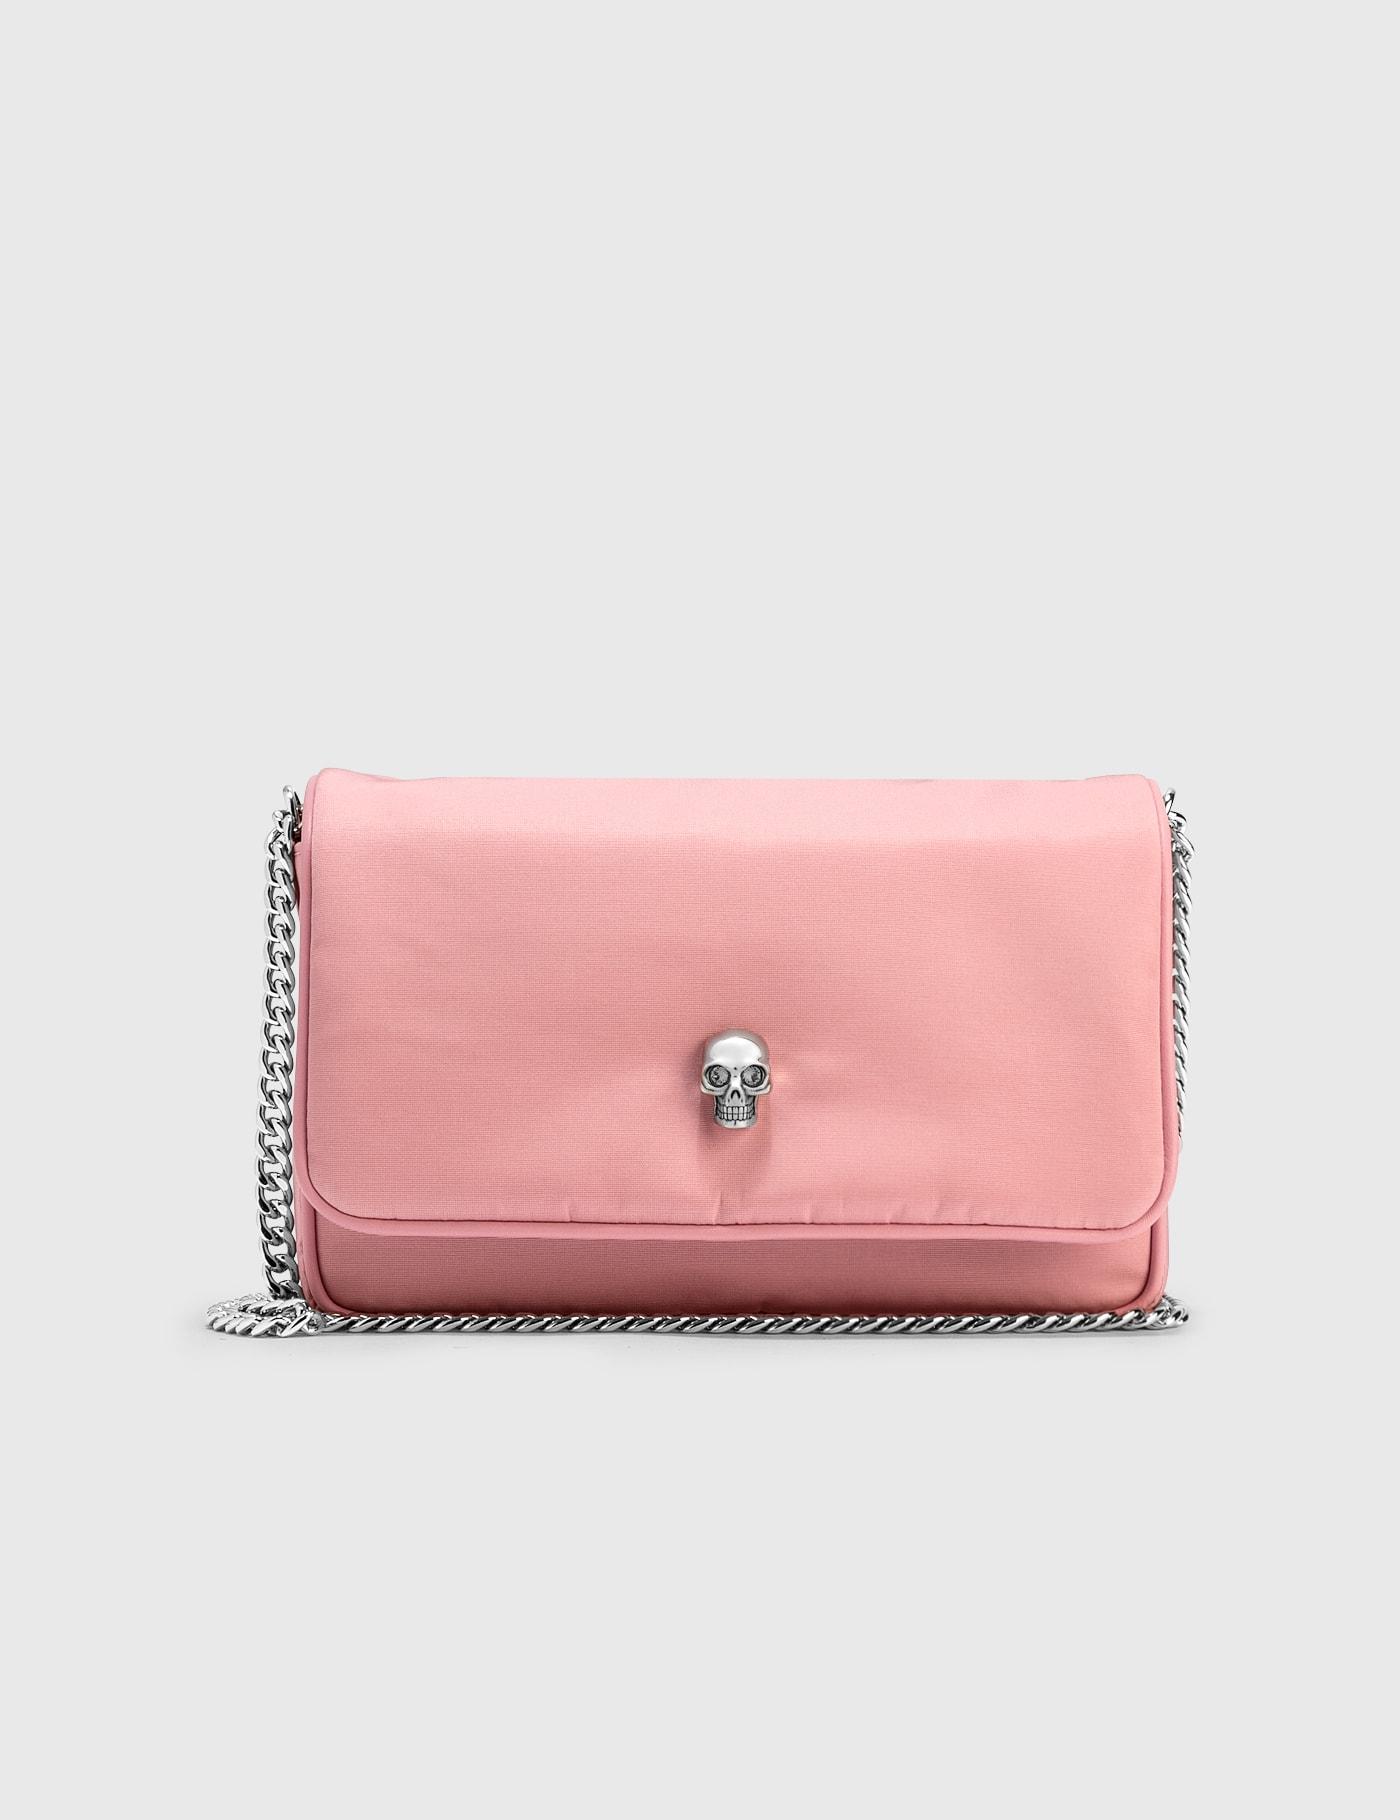 Alexander Mcqueen Small Skull Bag In Pink